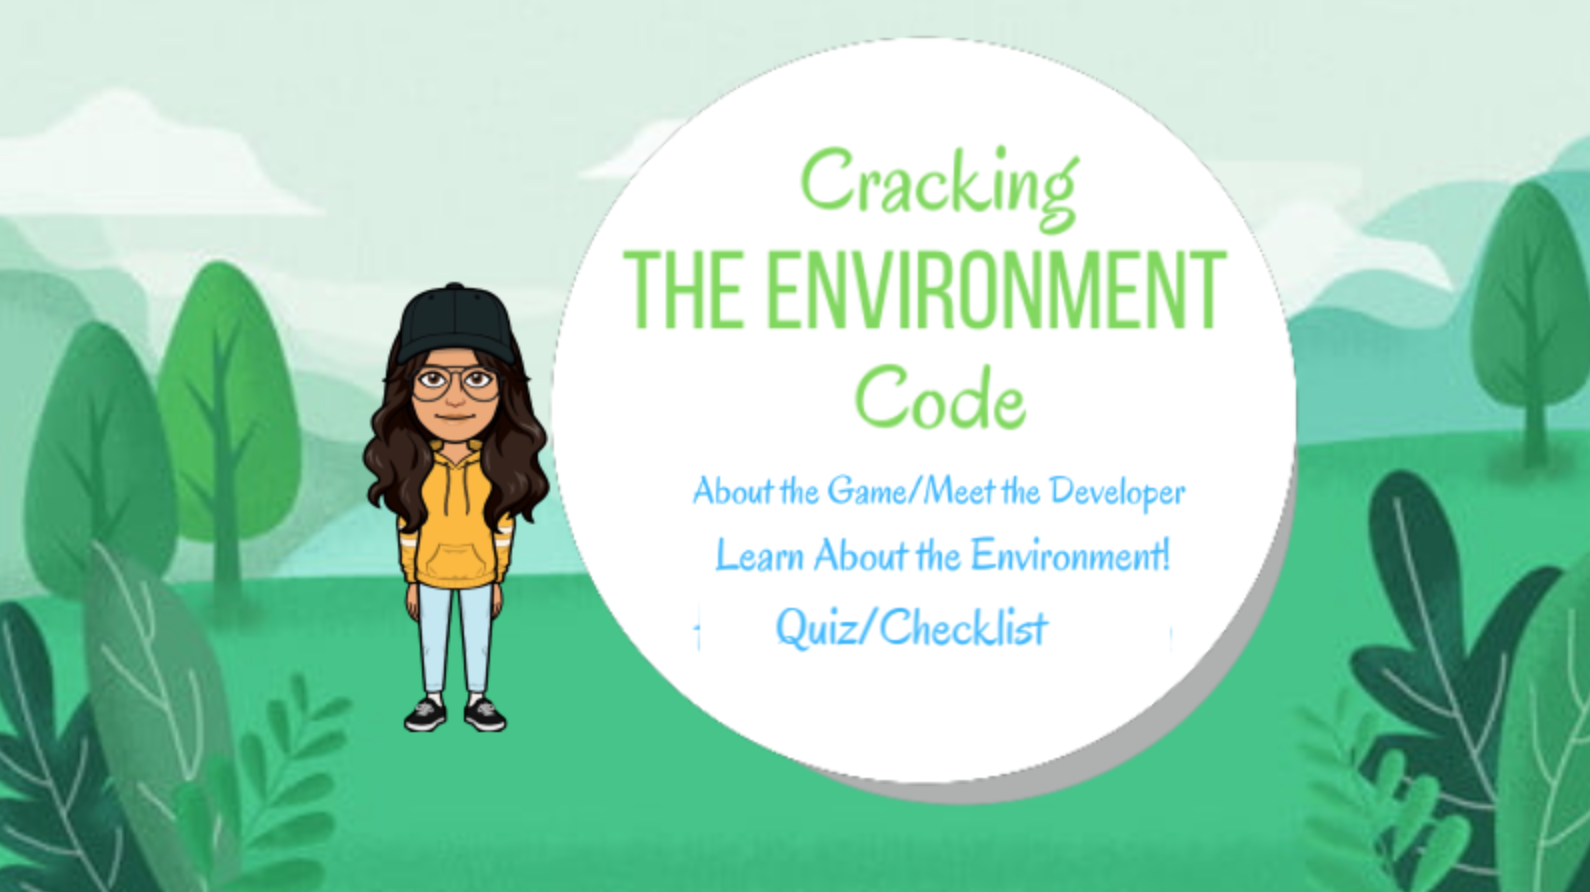 Cracking the Environment Code by Bhavani Potdar